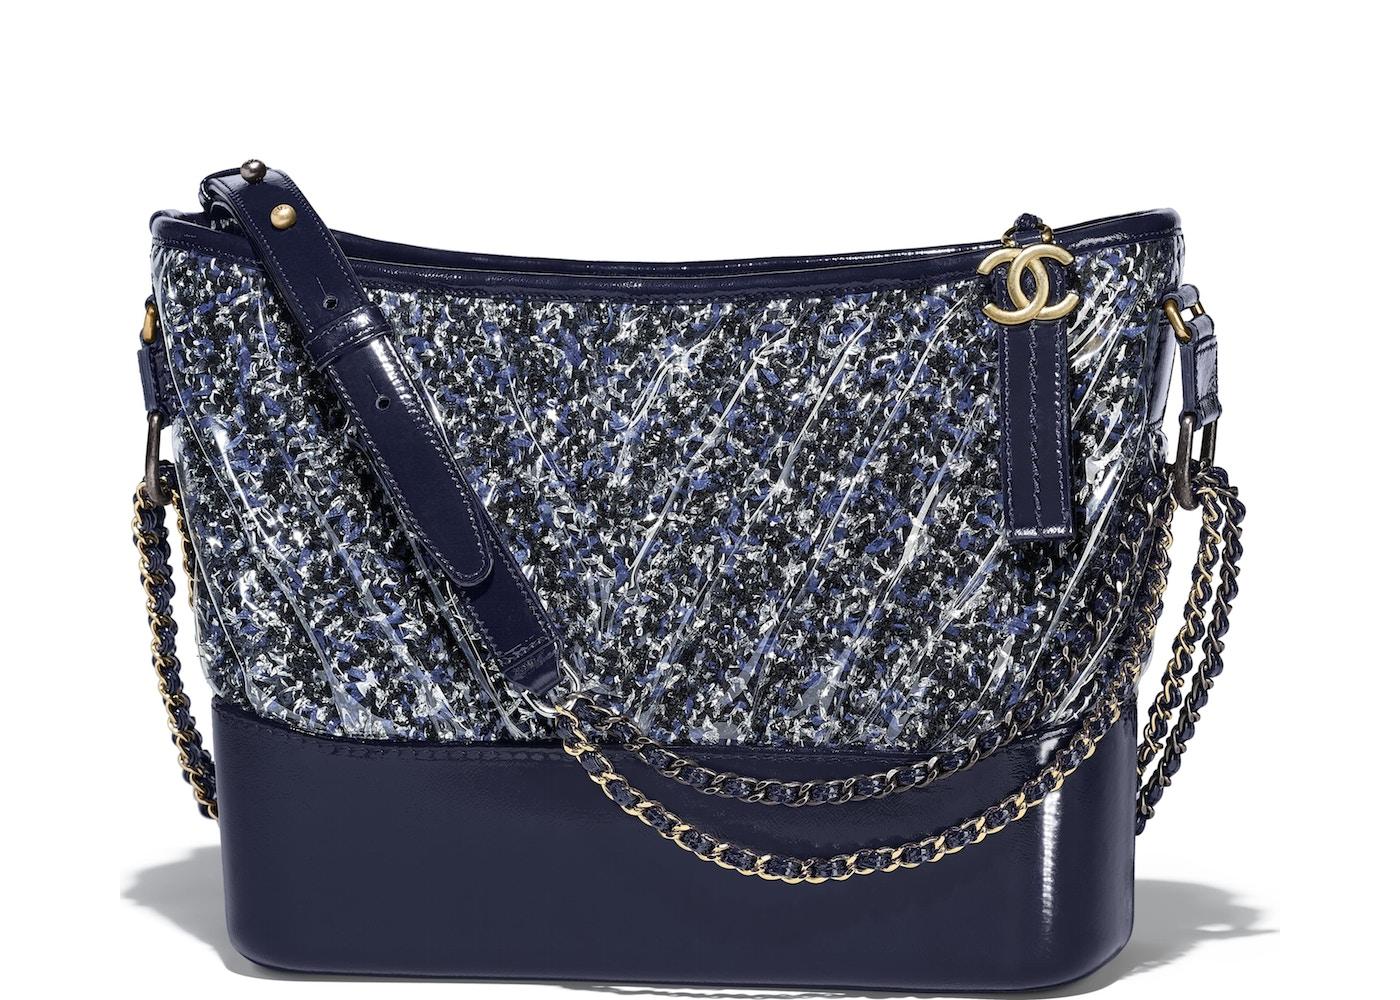 ec71eaf1e6 Sell. or Ask. View All Bids. Chanel Gabrielle Hobo Bag ...